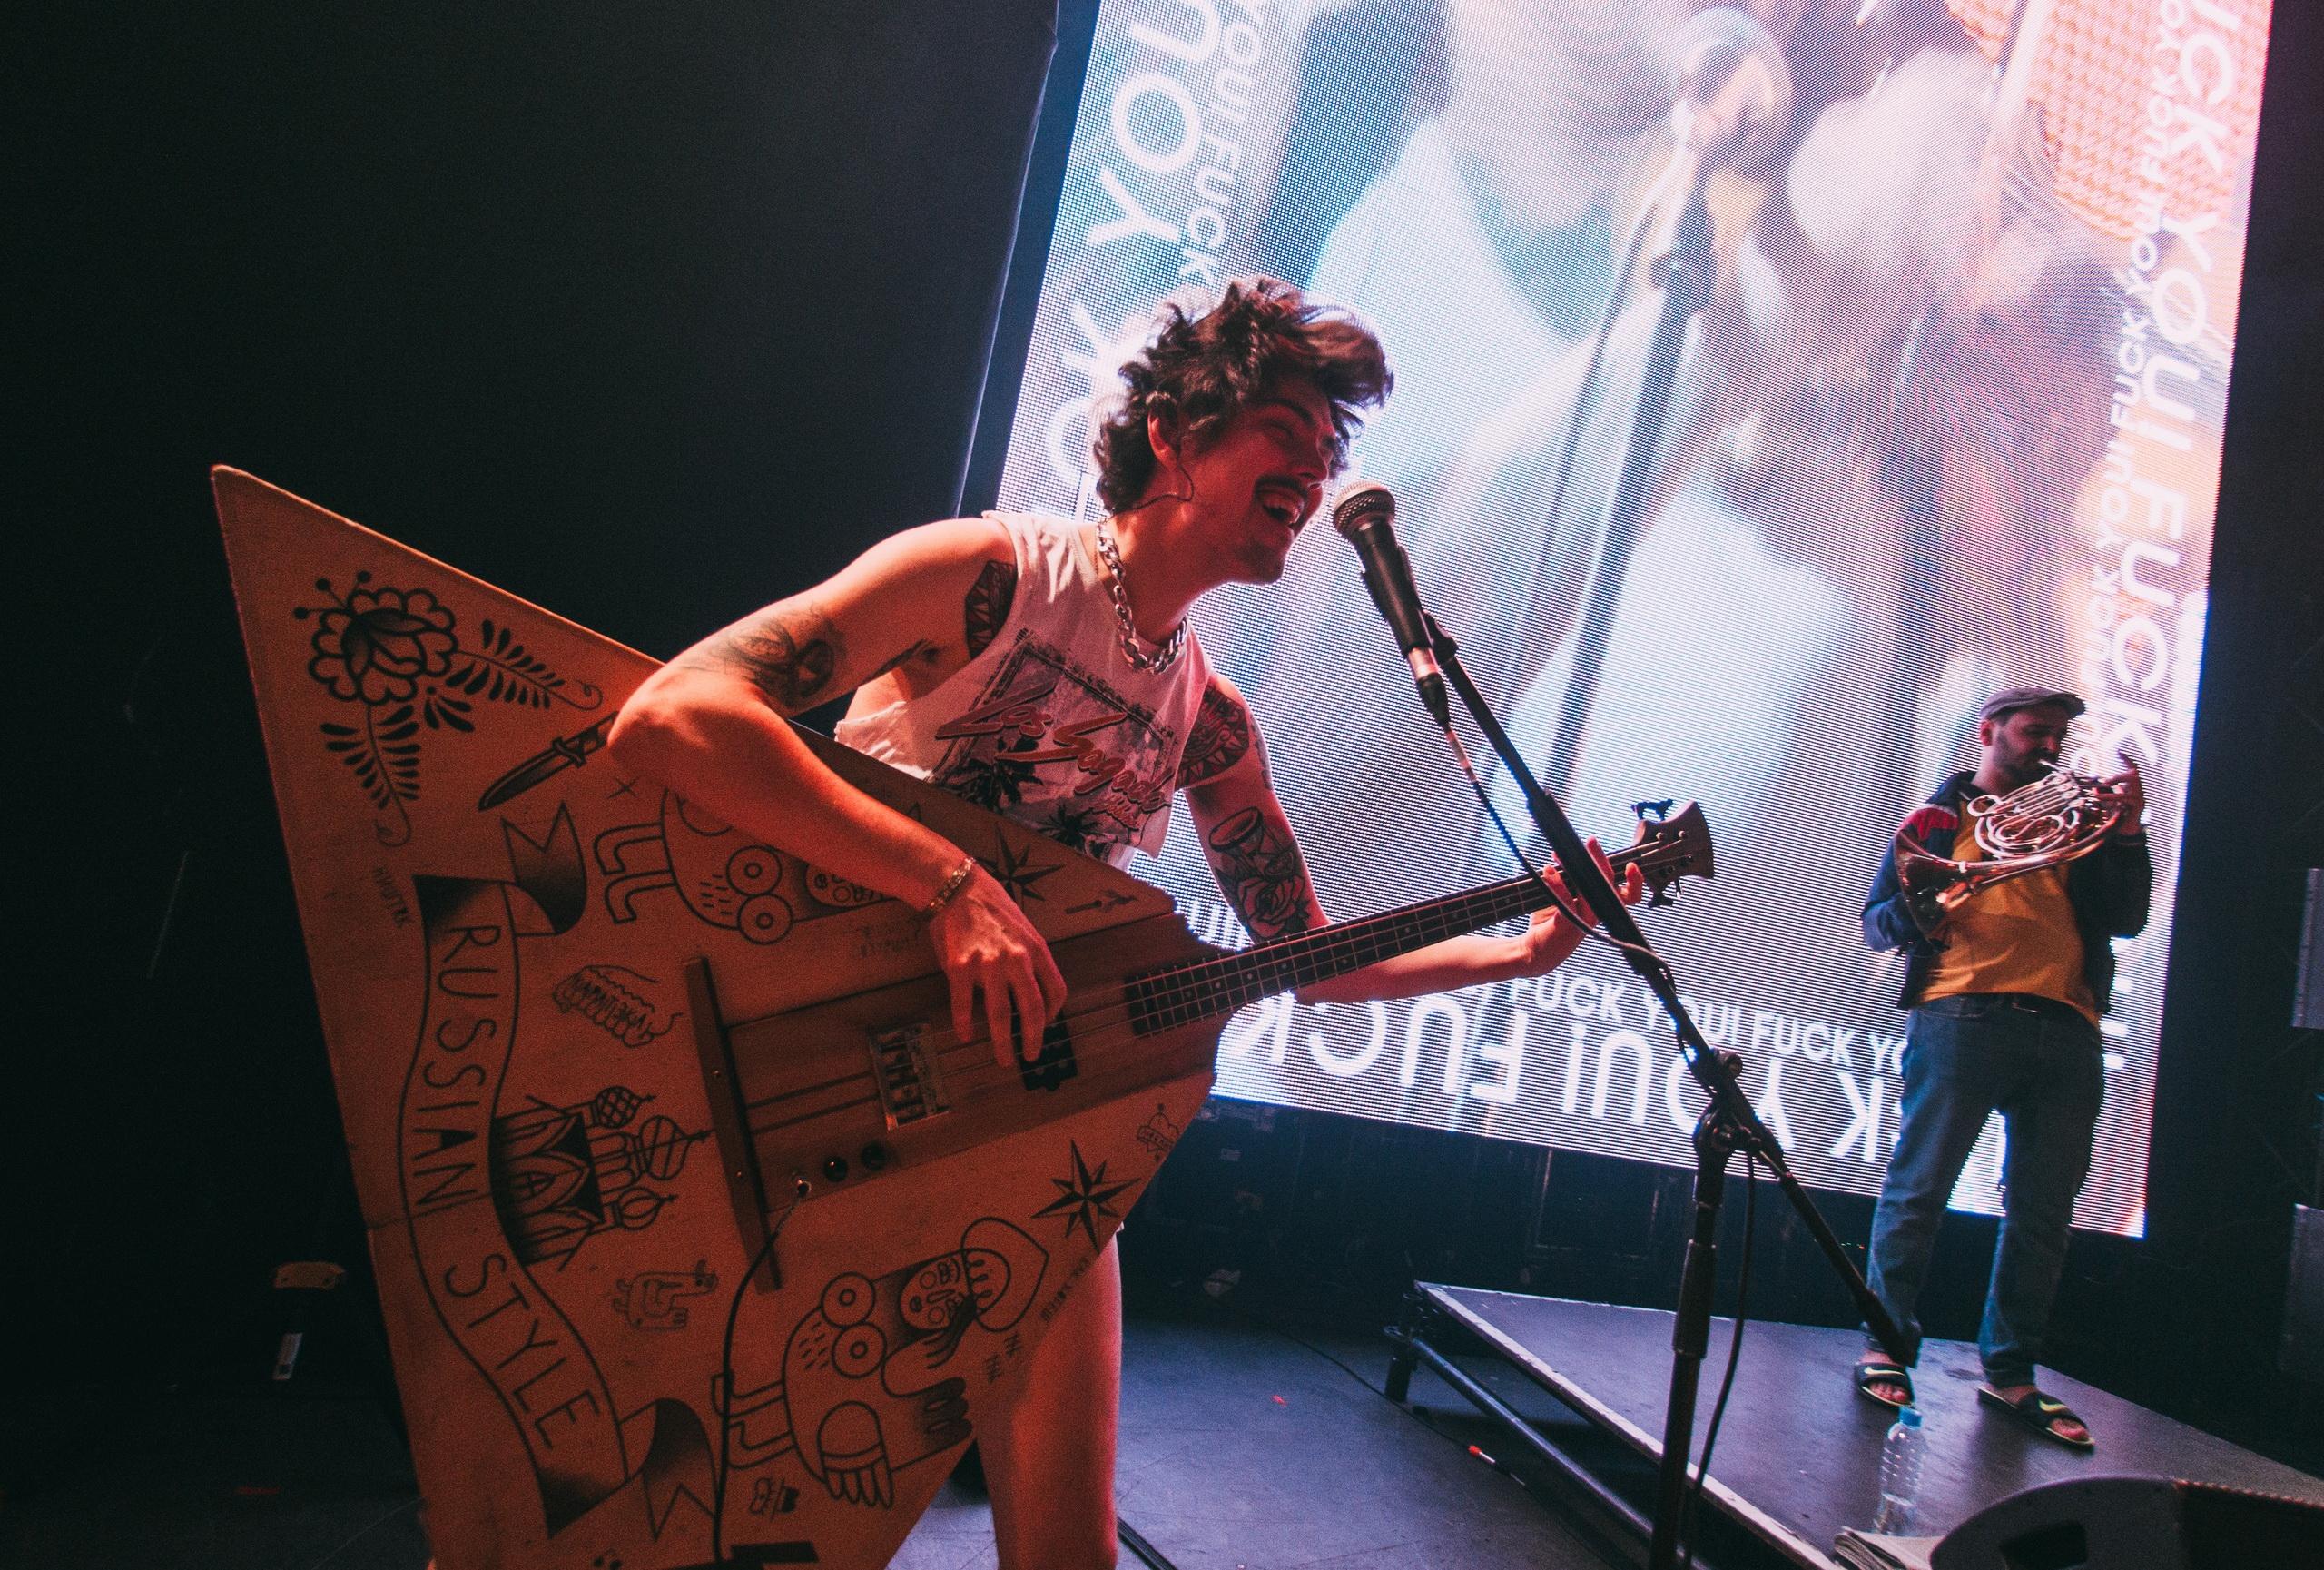 Фото с концерта группы The Hatters с сайта vk.com